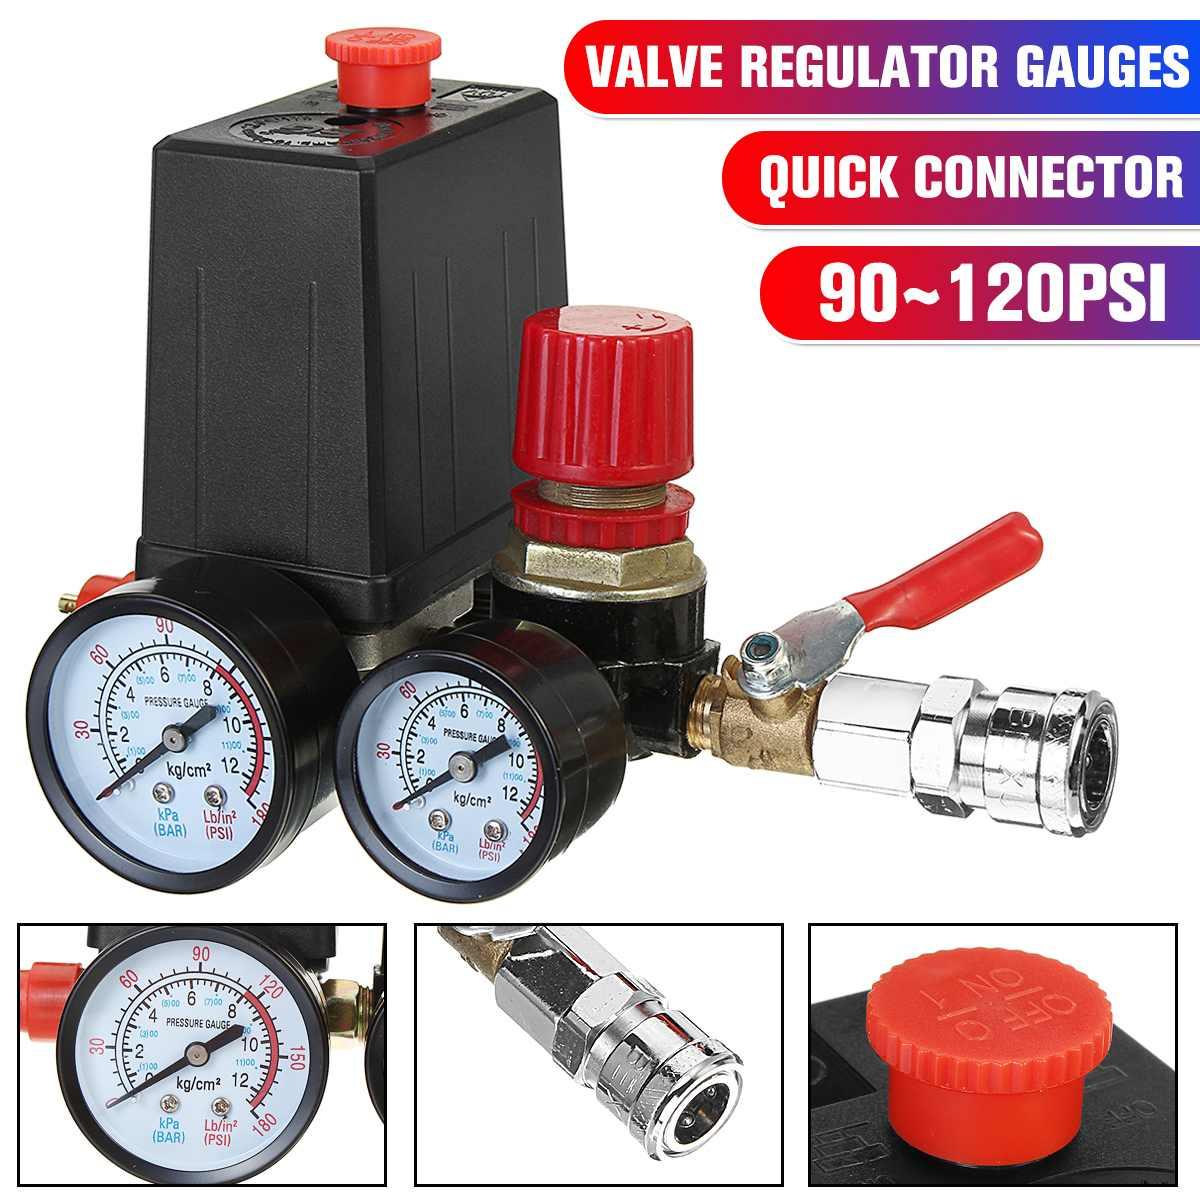 Válvula de conmutación con conector rápido, regulador múltiple de 240V, Control de presión de bomba de compresor de aire, válvula de 90-120 PSI con manómetro